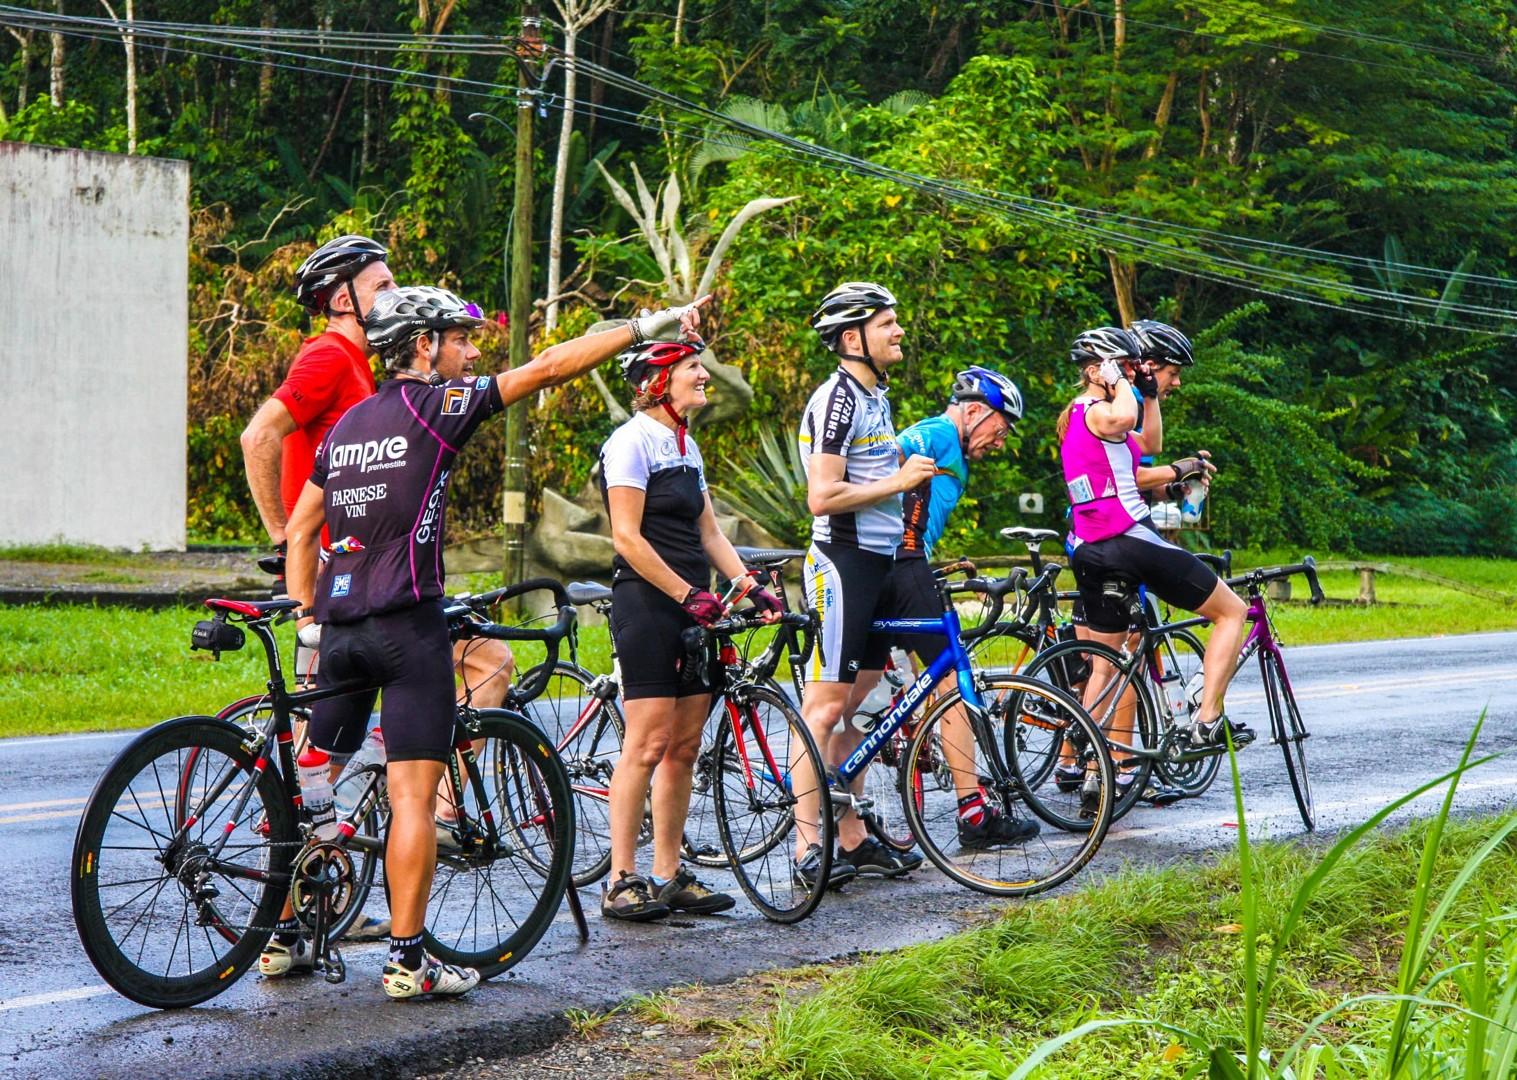 8056690499_115605db56_o.jpg - Costa Rica - Ruta de los Volcanes - Road Cycling